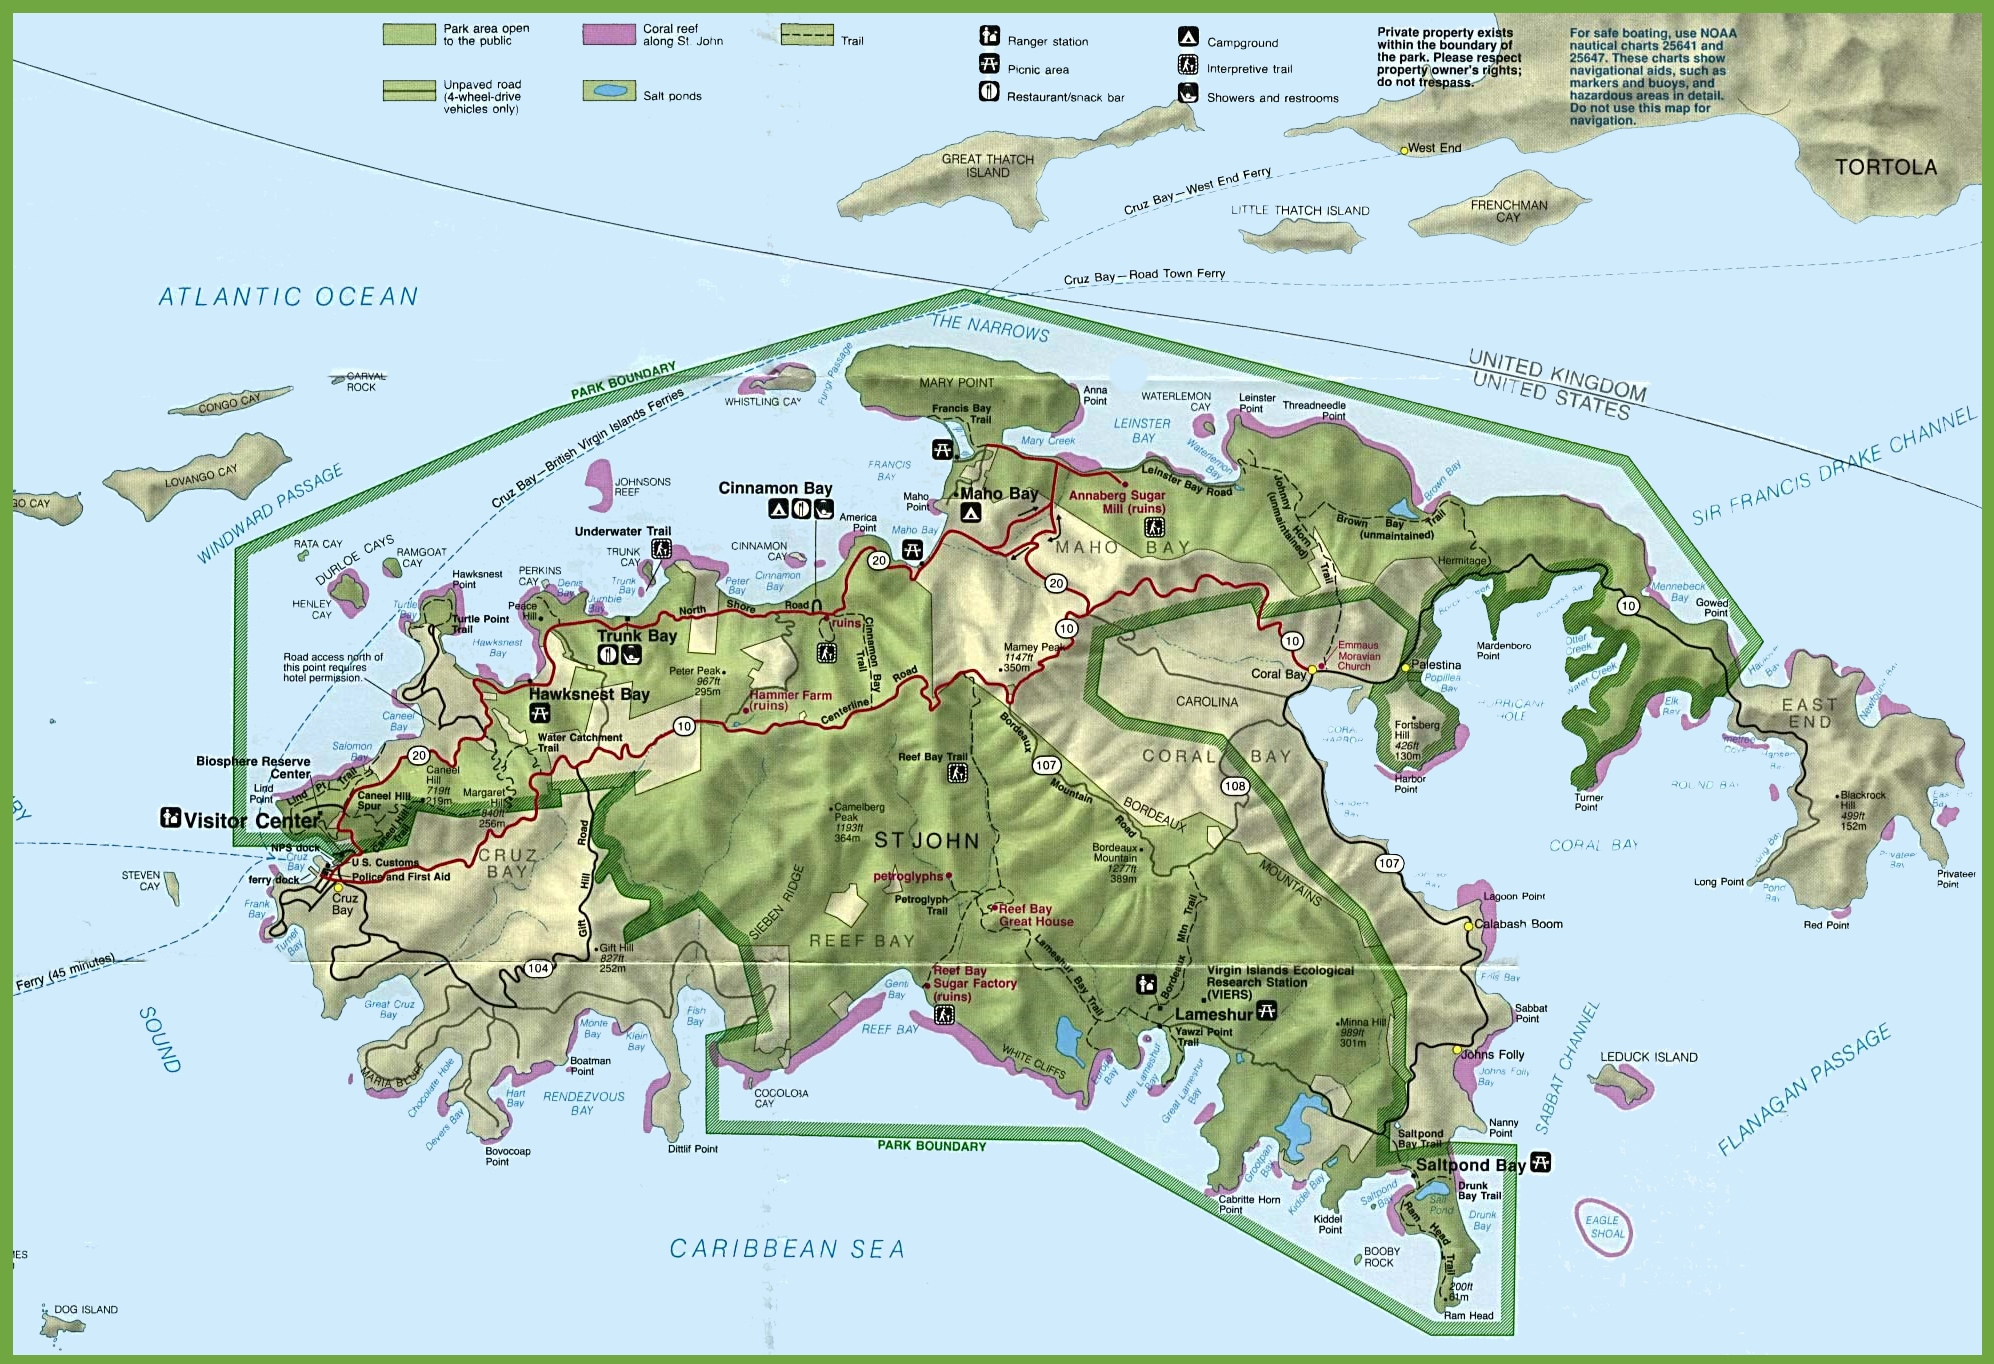 U.s. Virgin Islands Maps   Maps Of United States Virgin Islands - Printable Map Of St John Usvi